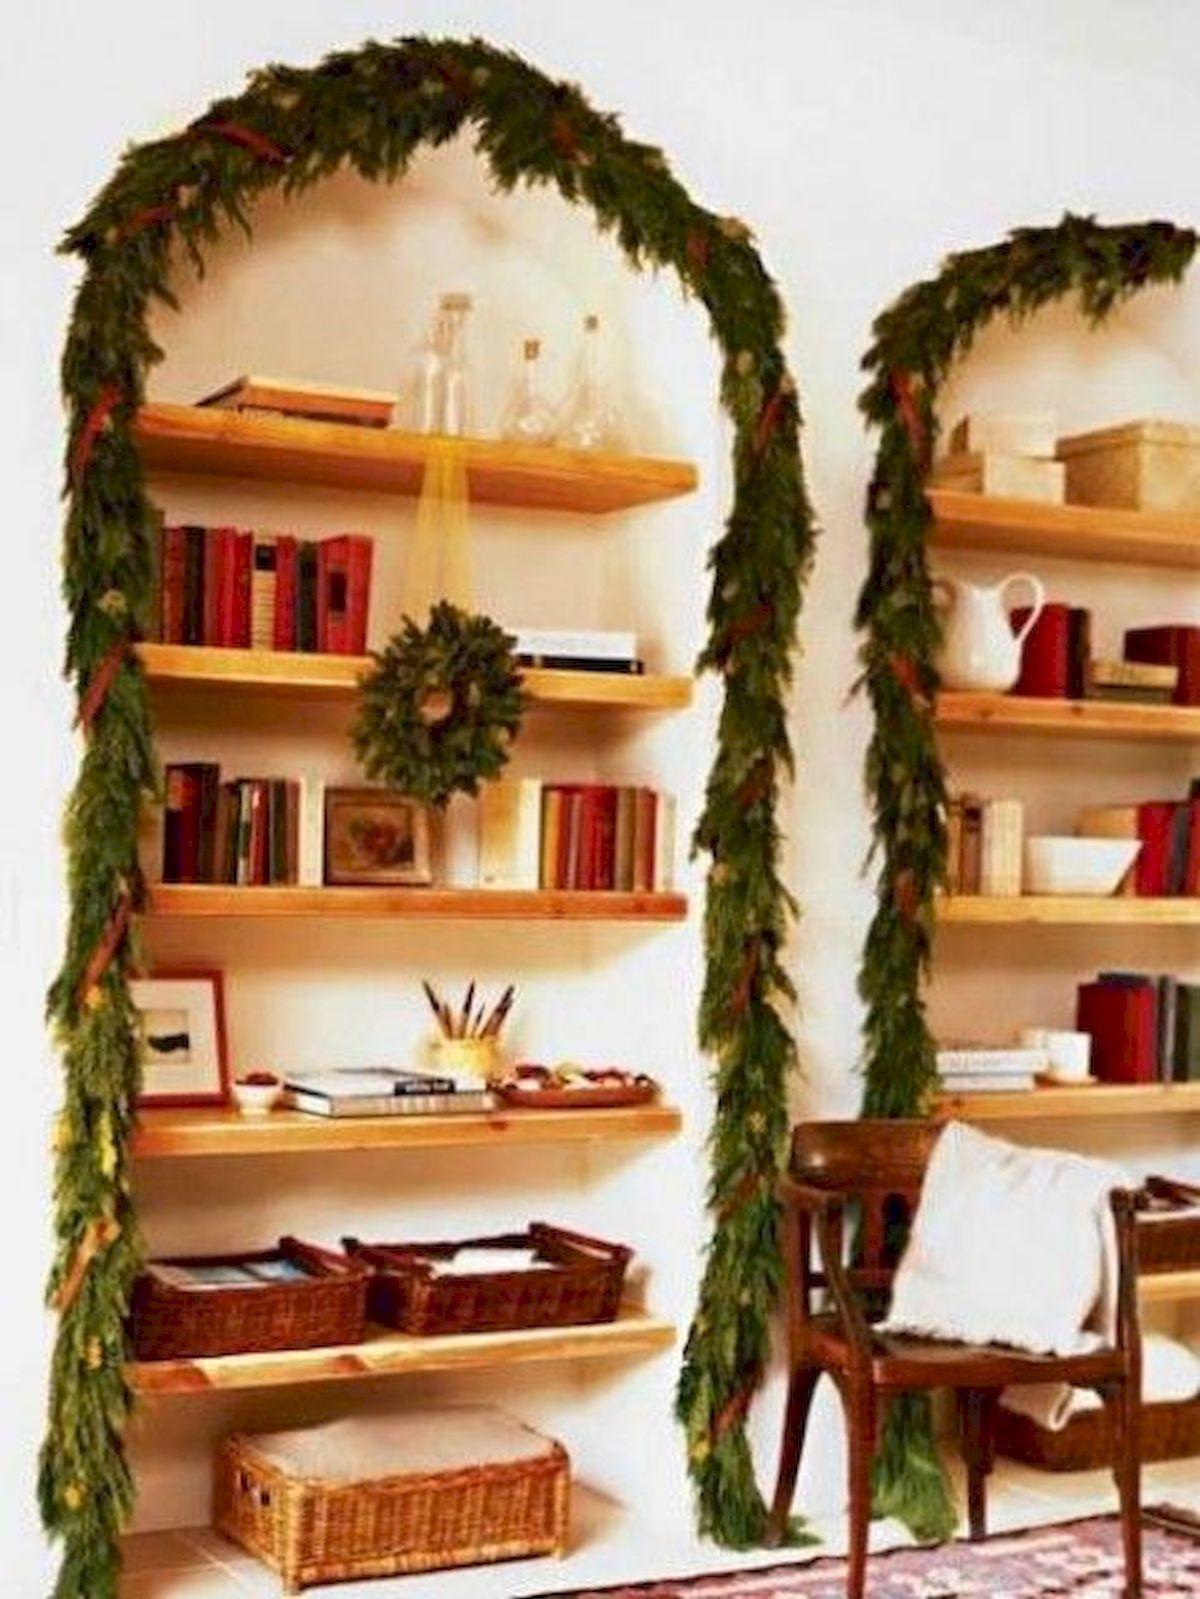 Awesome Christmas Bookshelves Decoration Ideas Https Hajarfresh Com Christmas Bookshelves Decoration Ideas Christmas Bookshelf Decor Bookshelf Decor